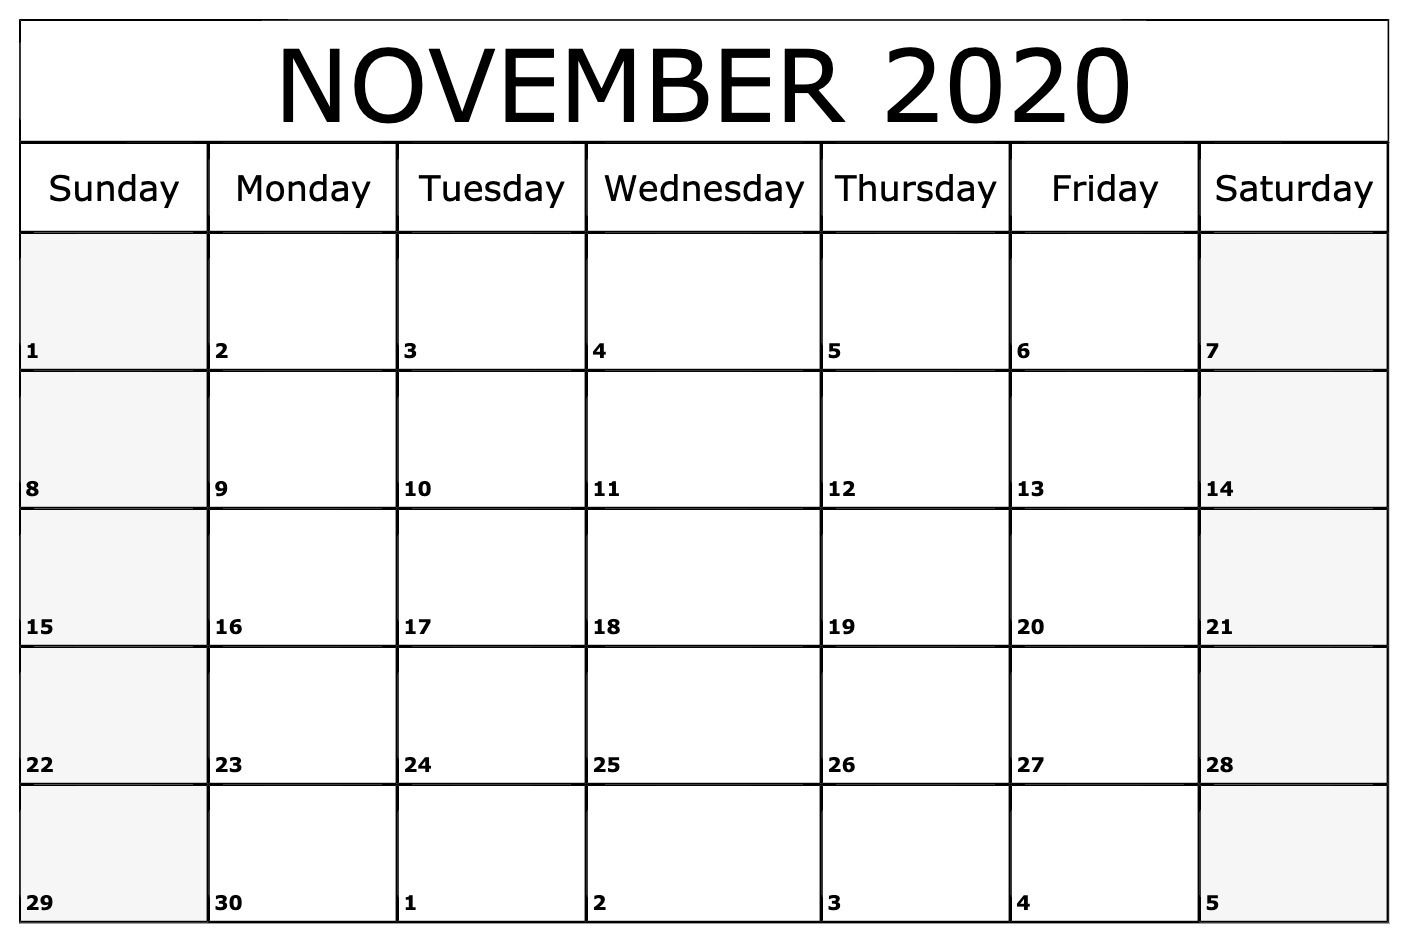 November 2020 Calendar Printable Template   Monthly